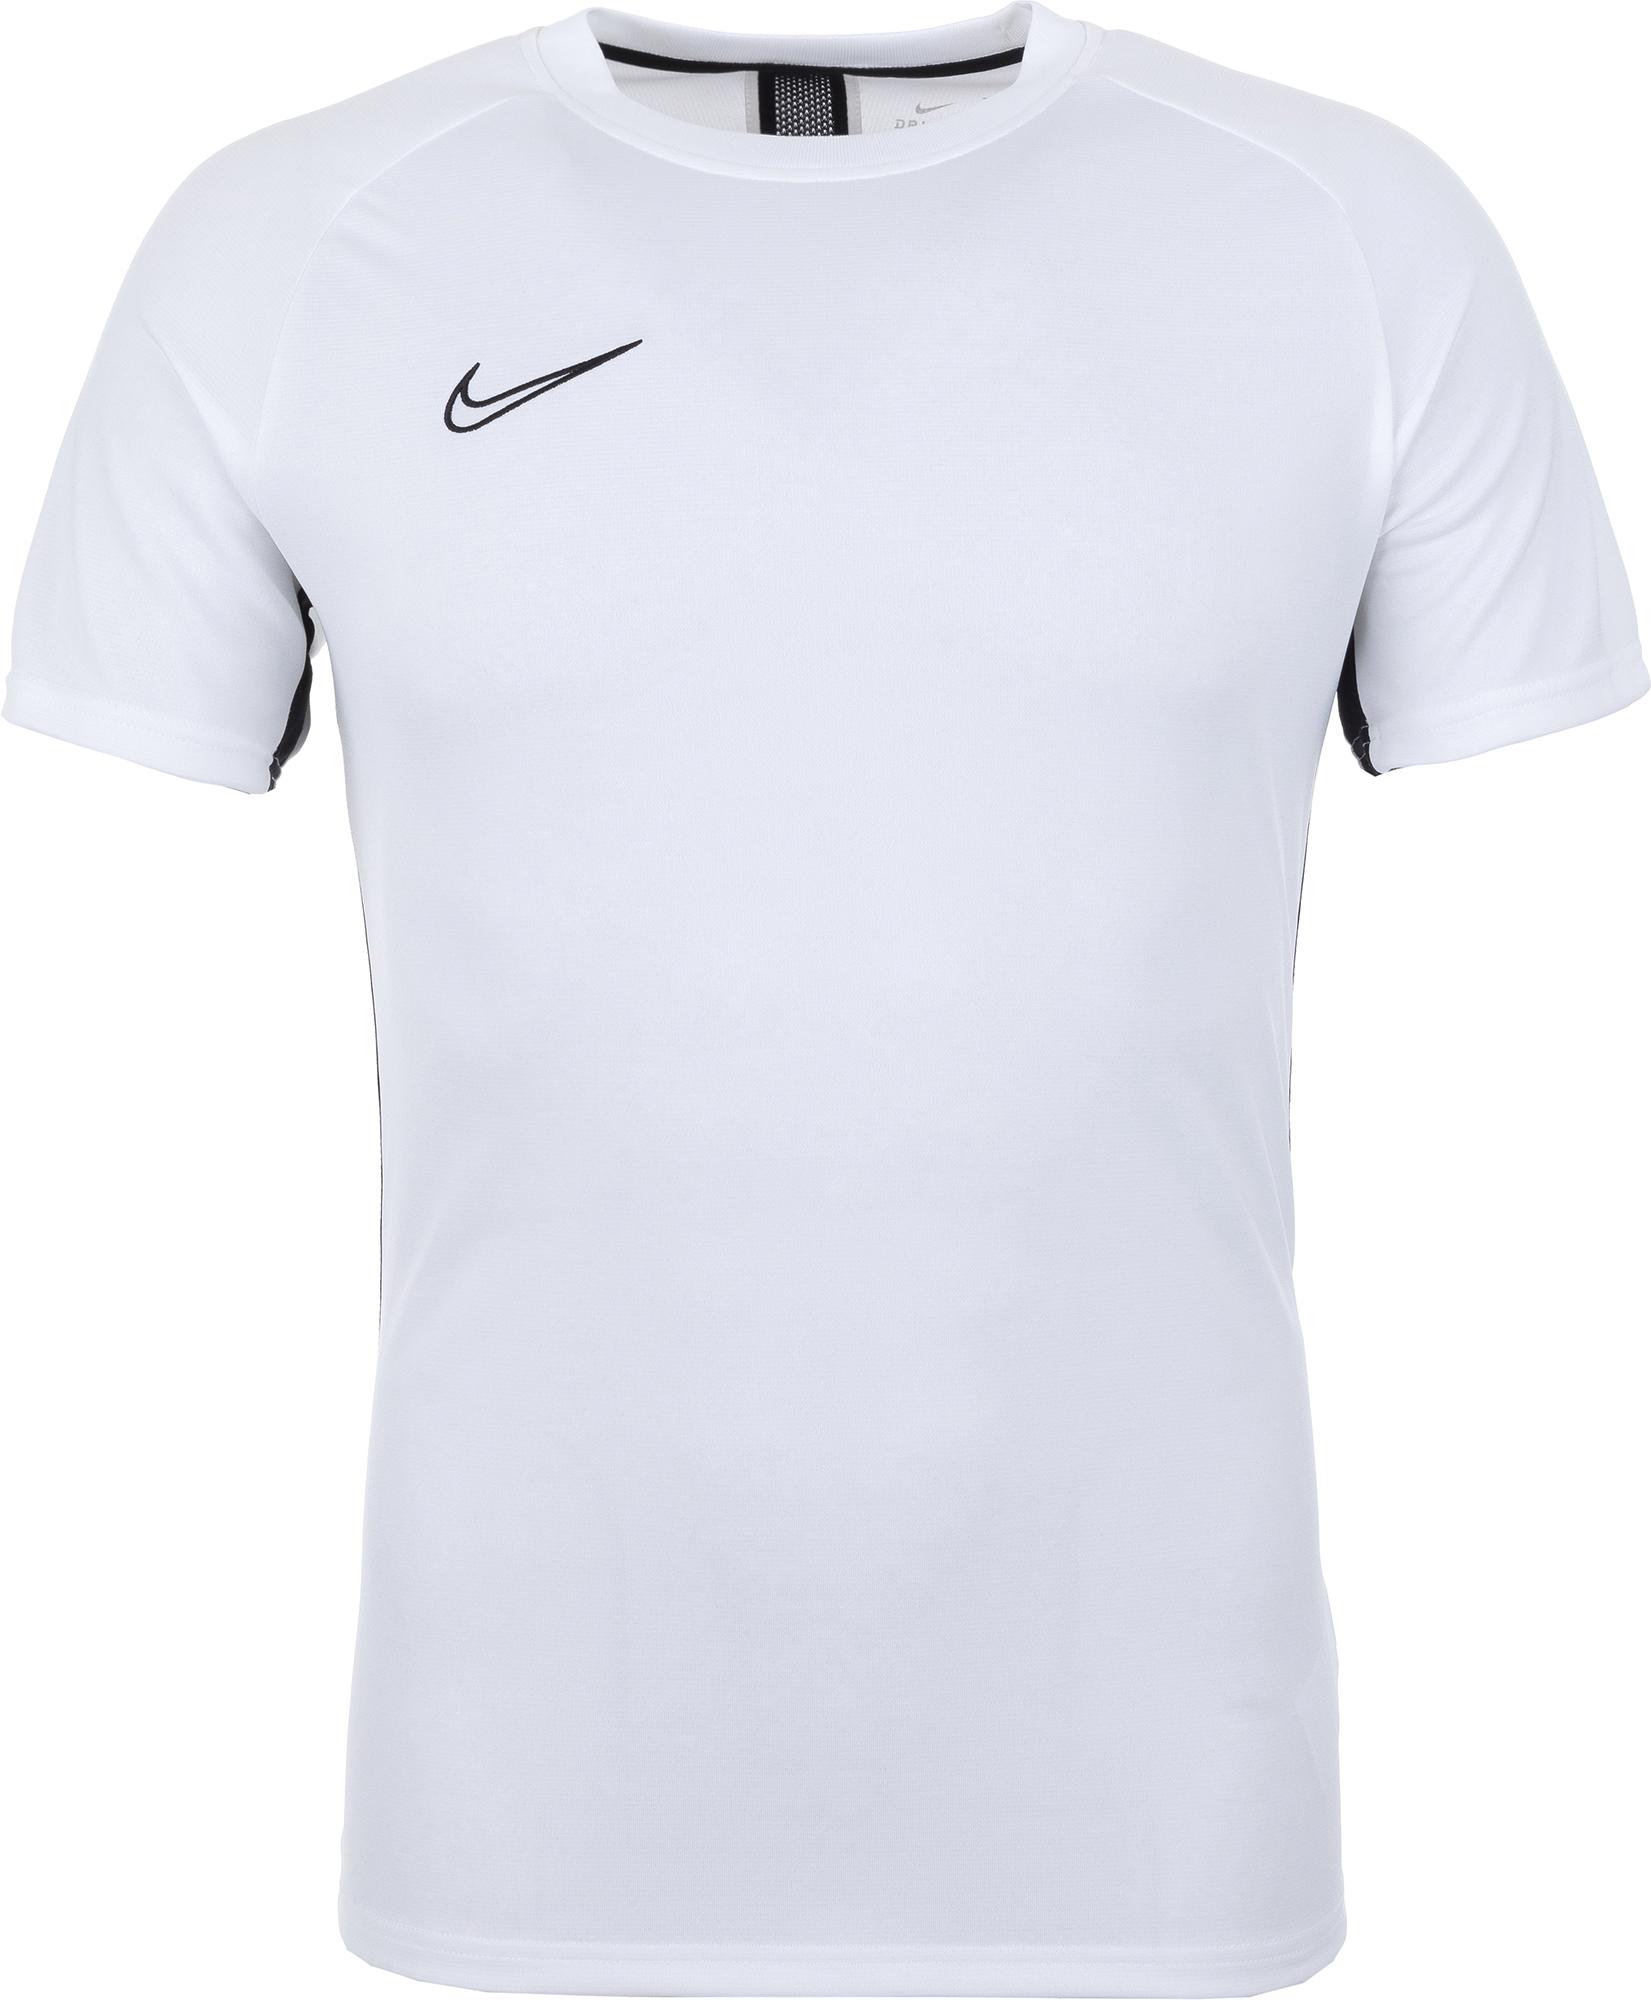 Nike Футболка мужская Nike Dry Academy, размер 52-54